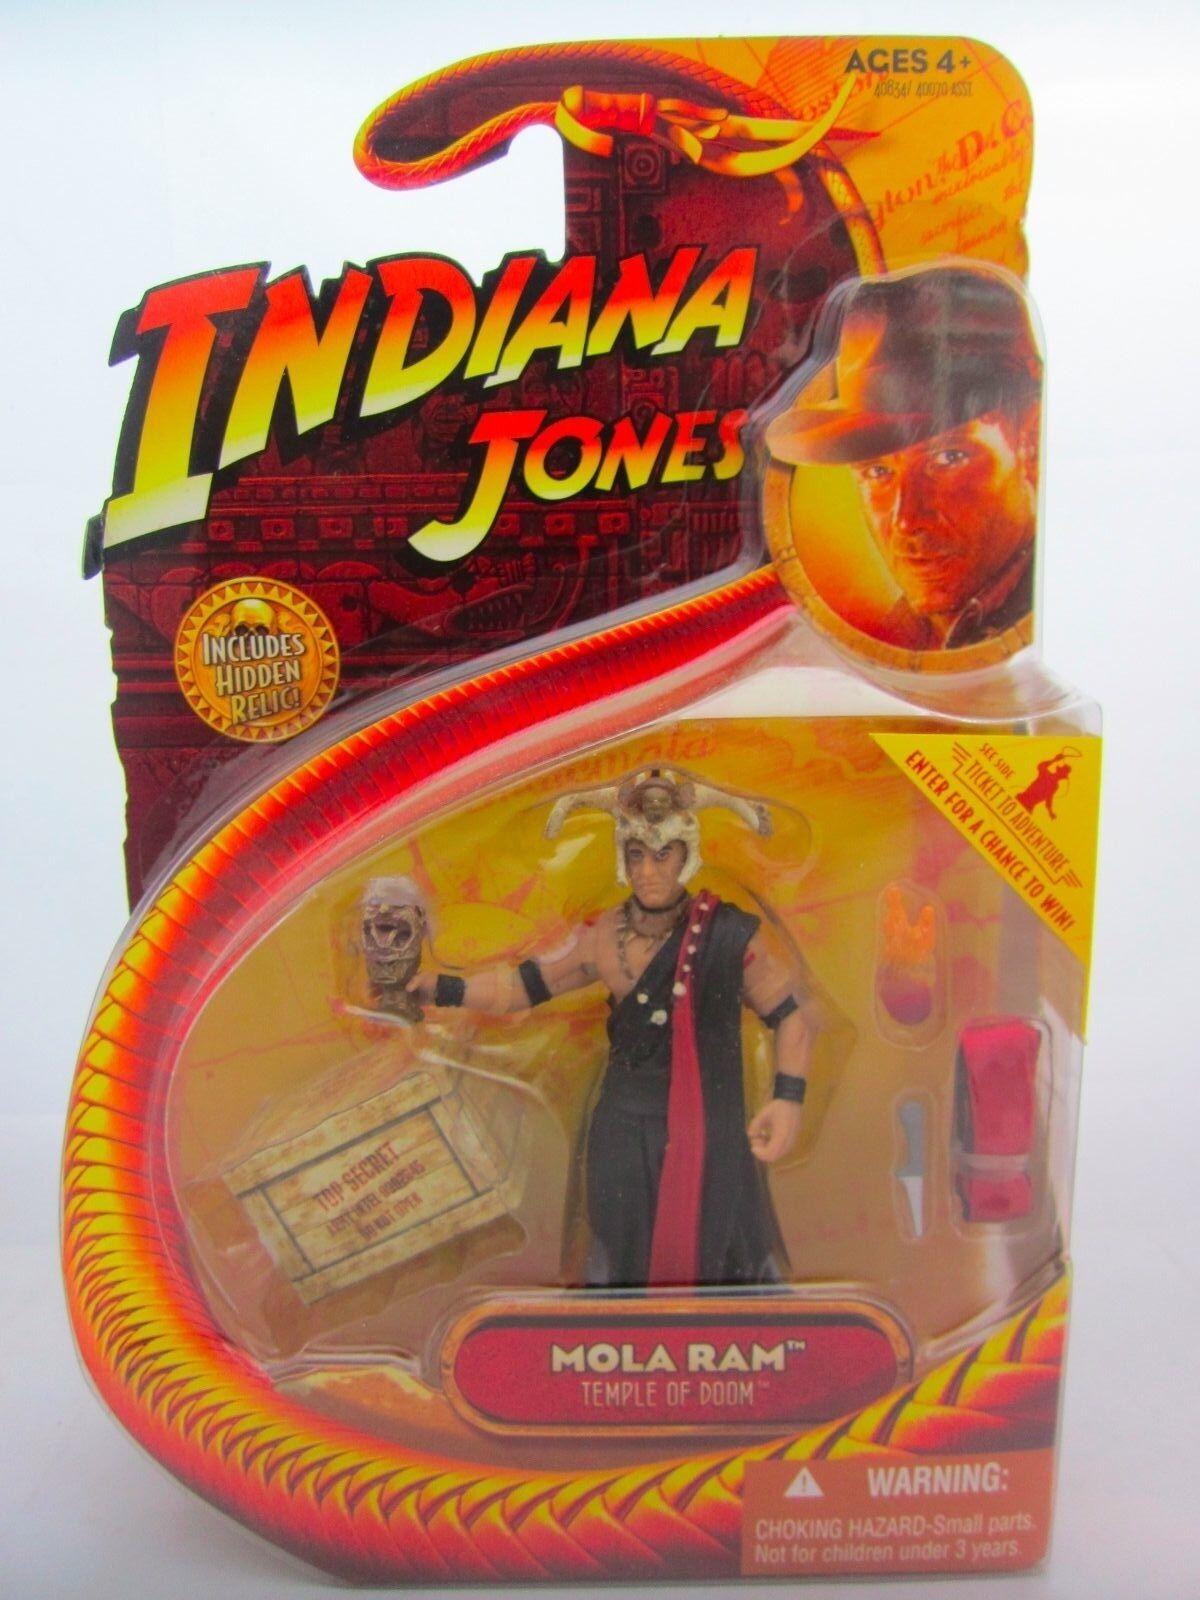 INDIANA JONES TEMPIO MALEDETTO MOLA RAM Toy Action Figure MOC sigillato HASBRO 2008